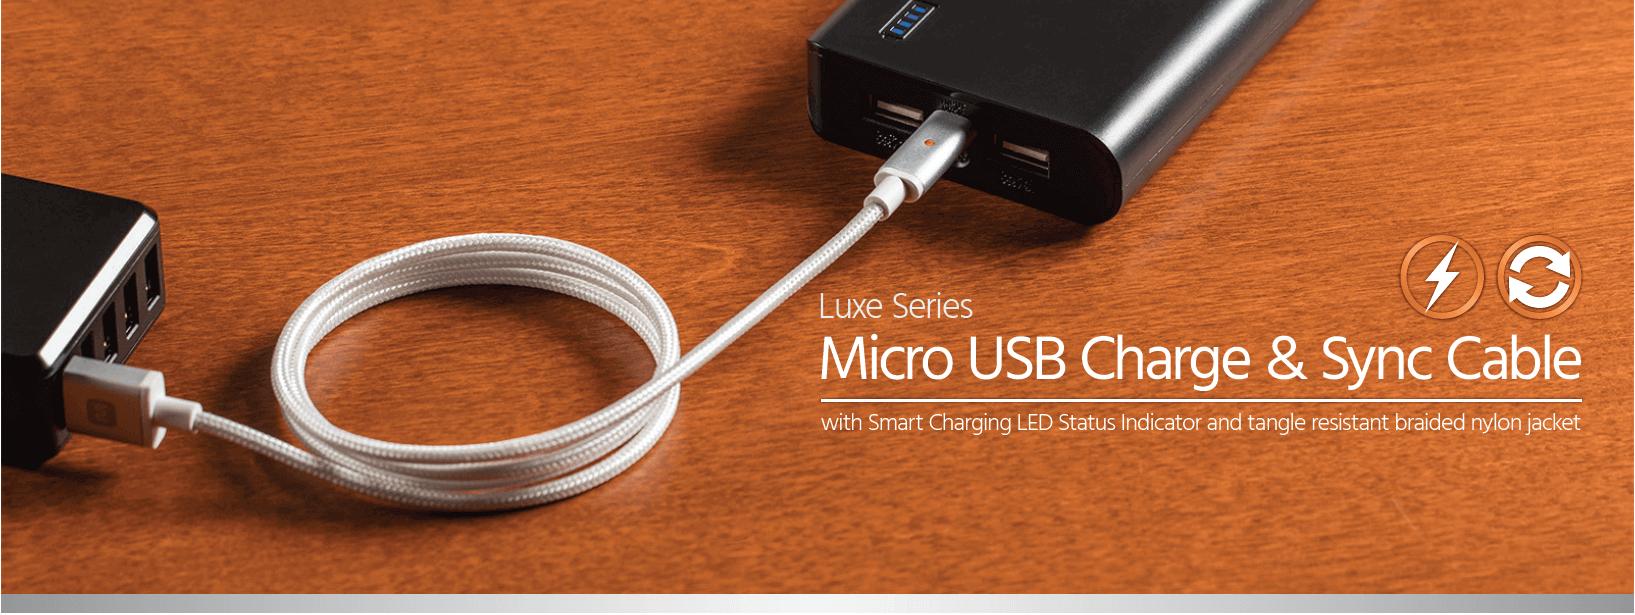 Luxe Micro USB